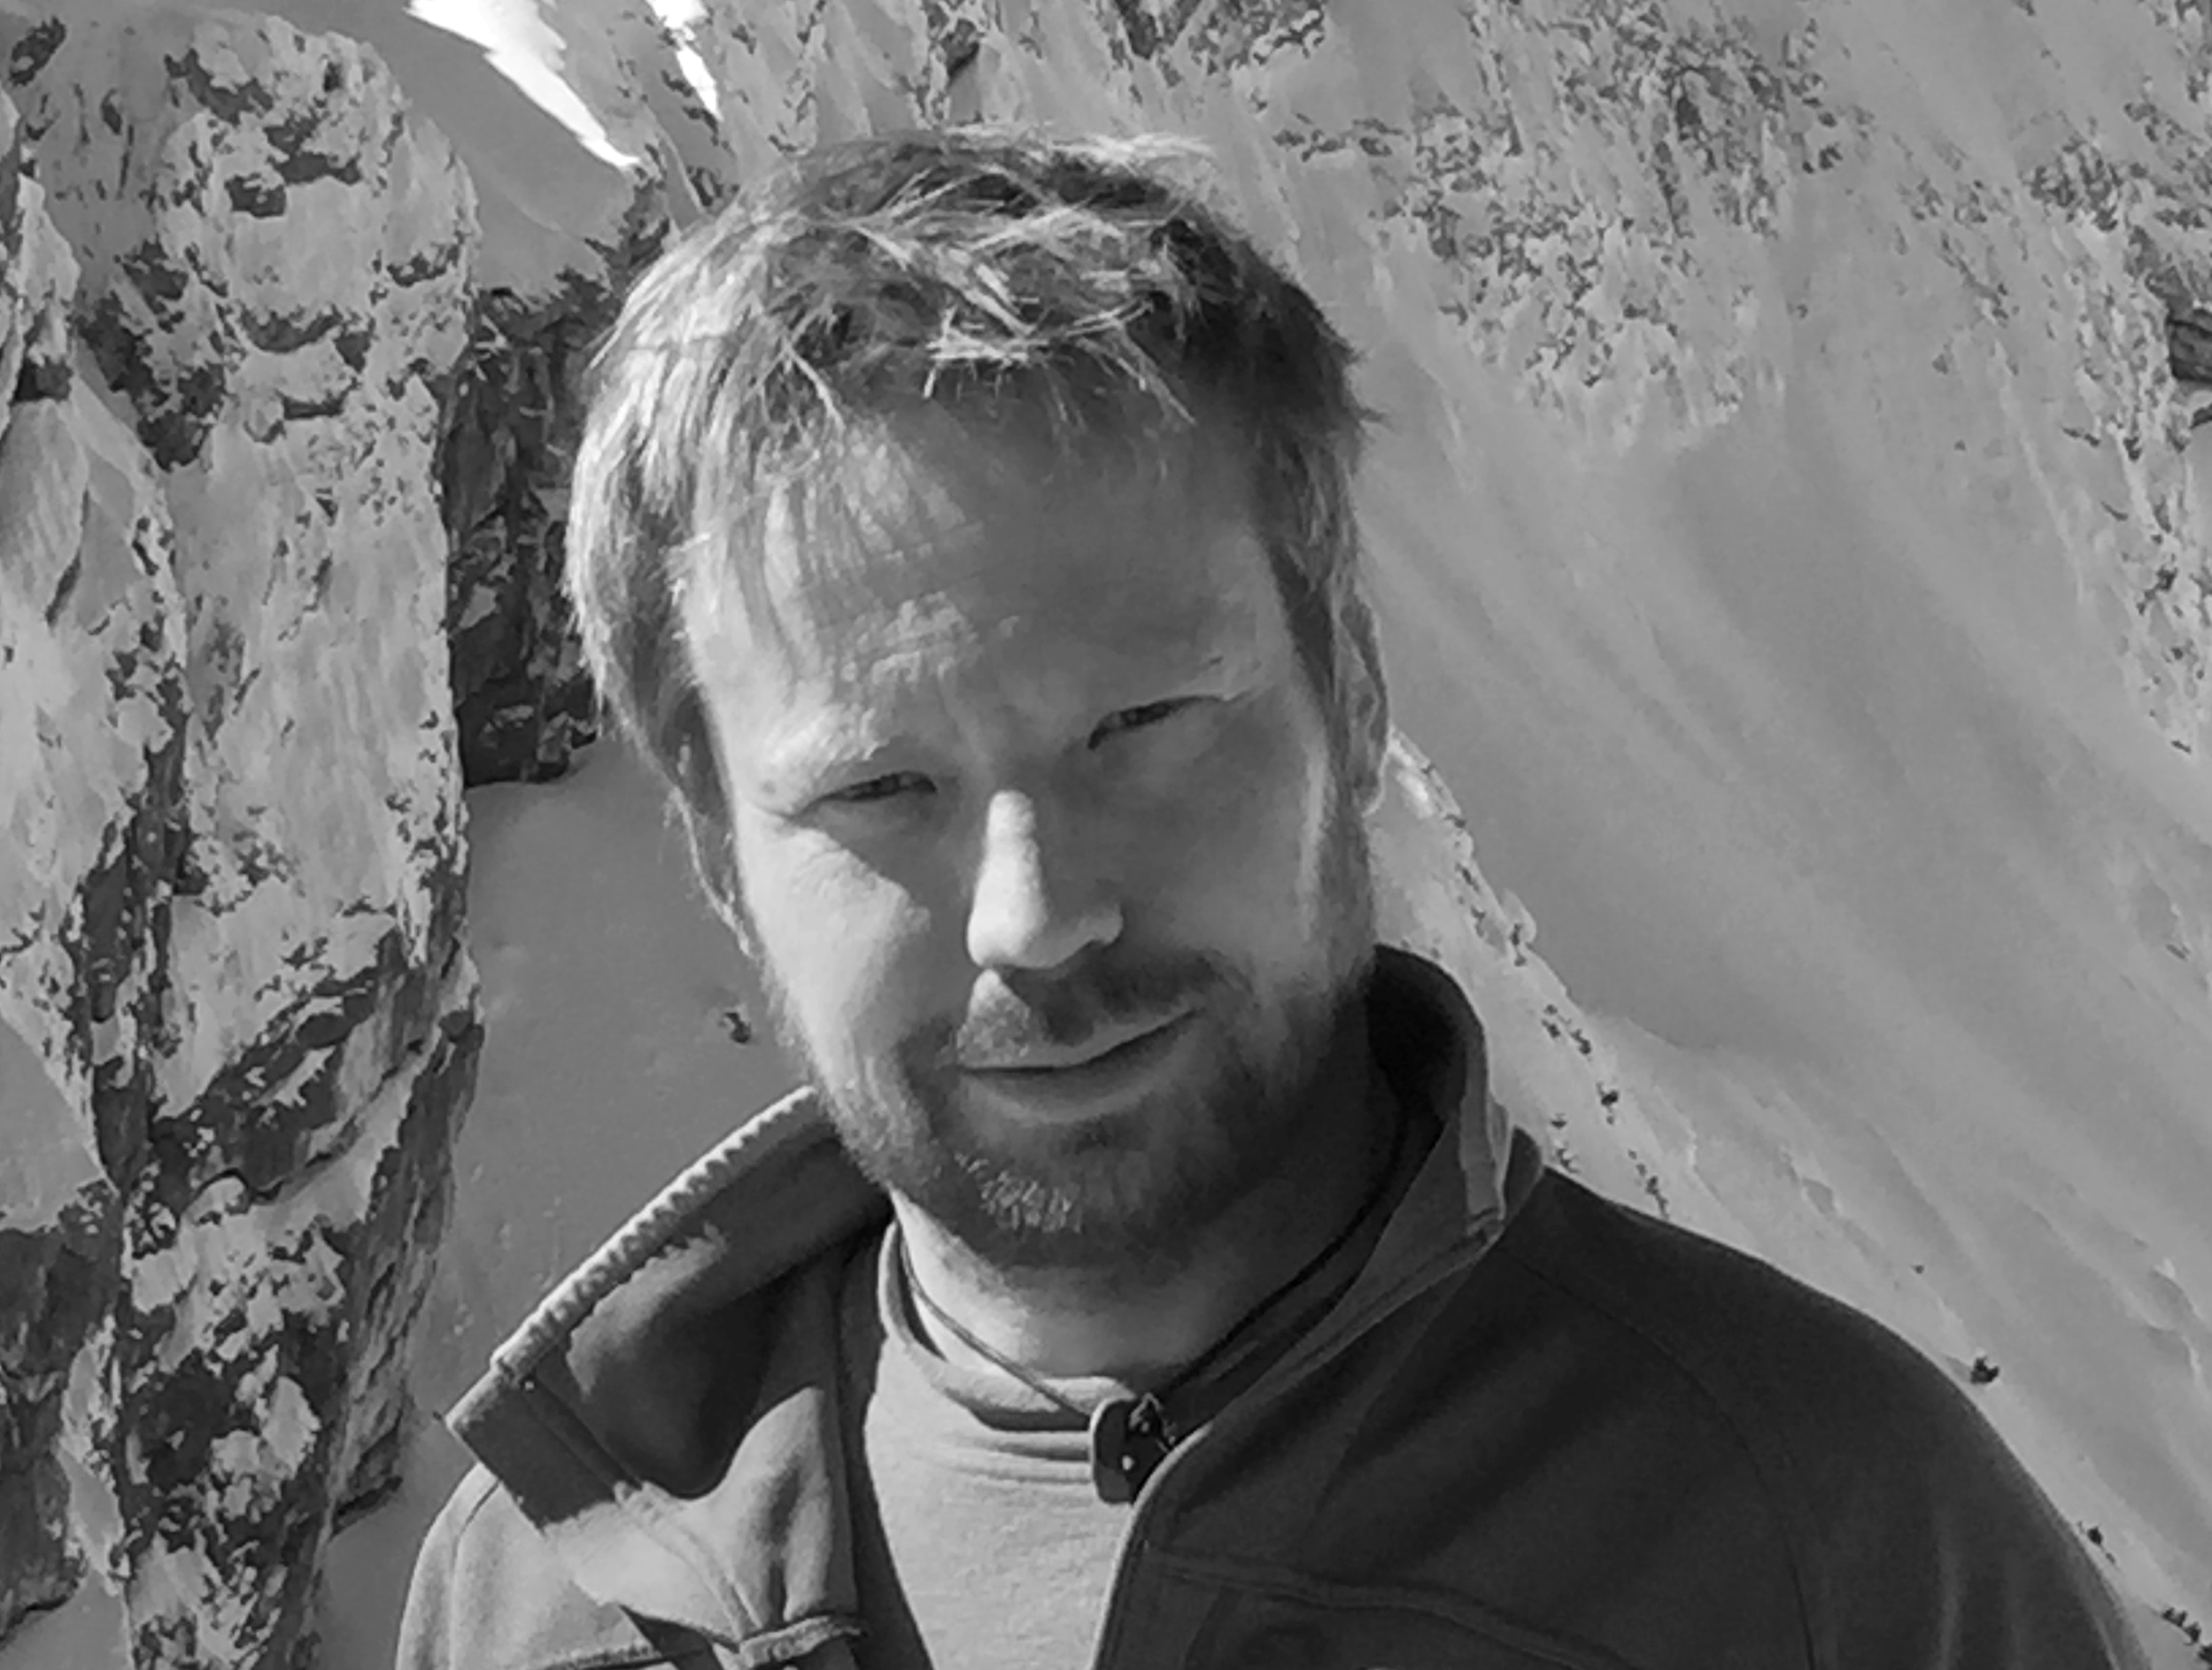 Skylotec Klettergurt Preisvergleich : Sicher im klettersteig skylotec